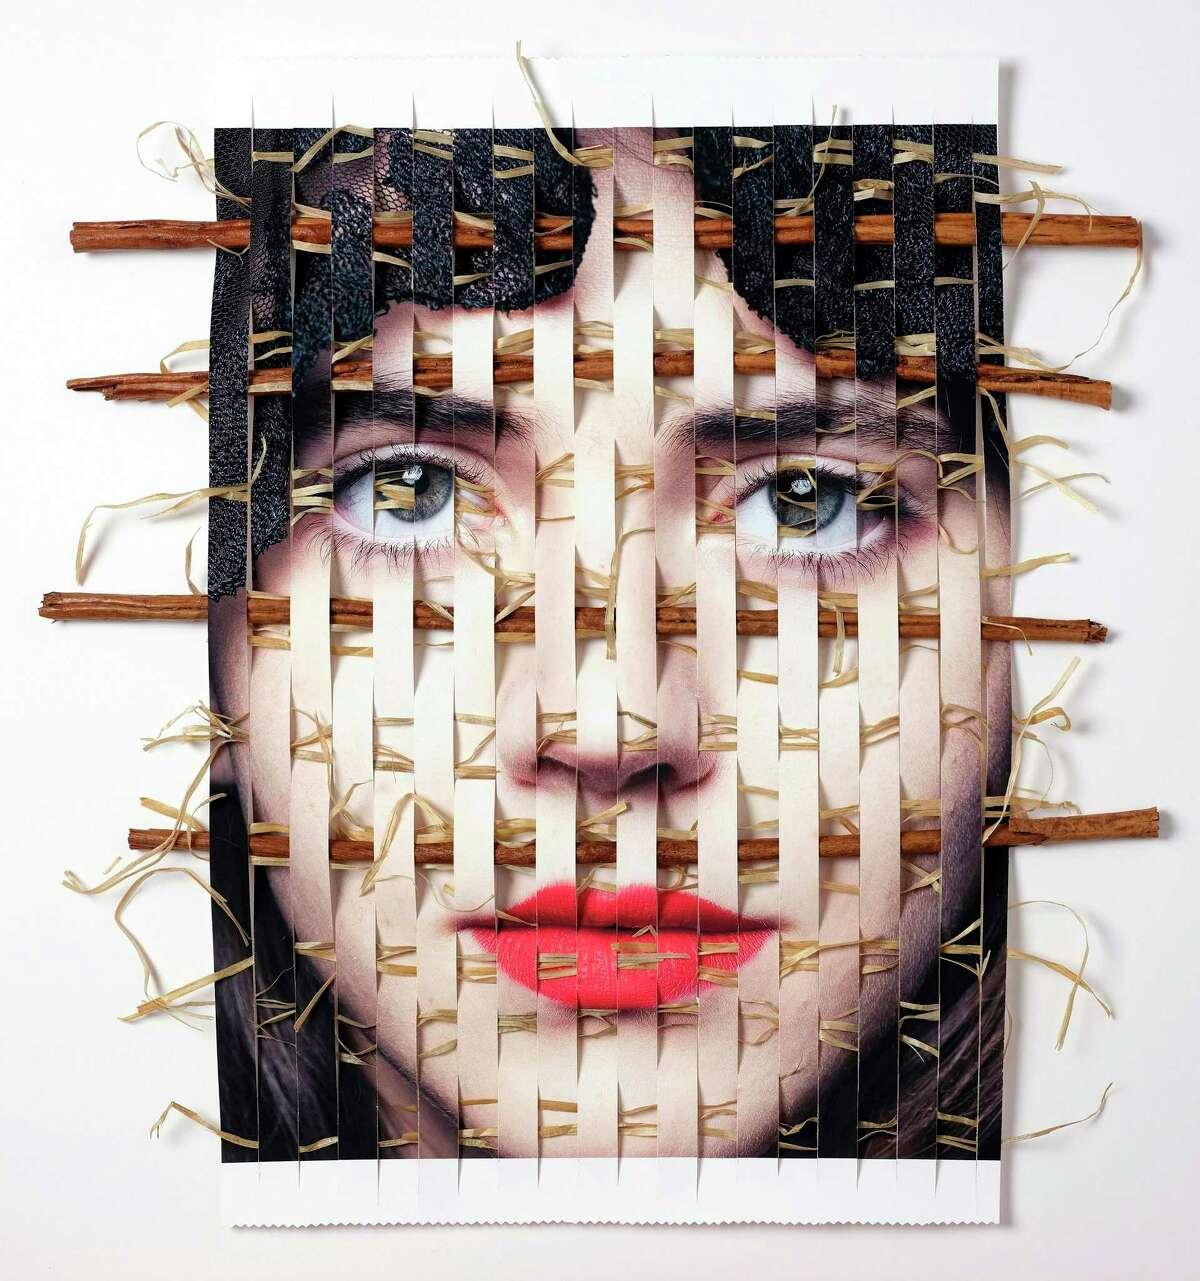 Mexican artist Lou Peraulta's first U.S. exhibition,